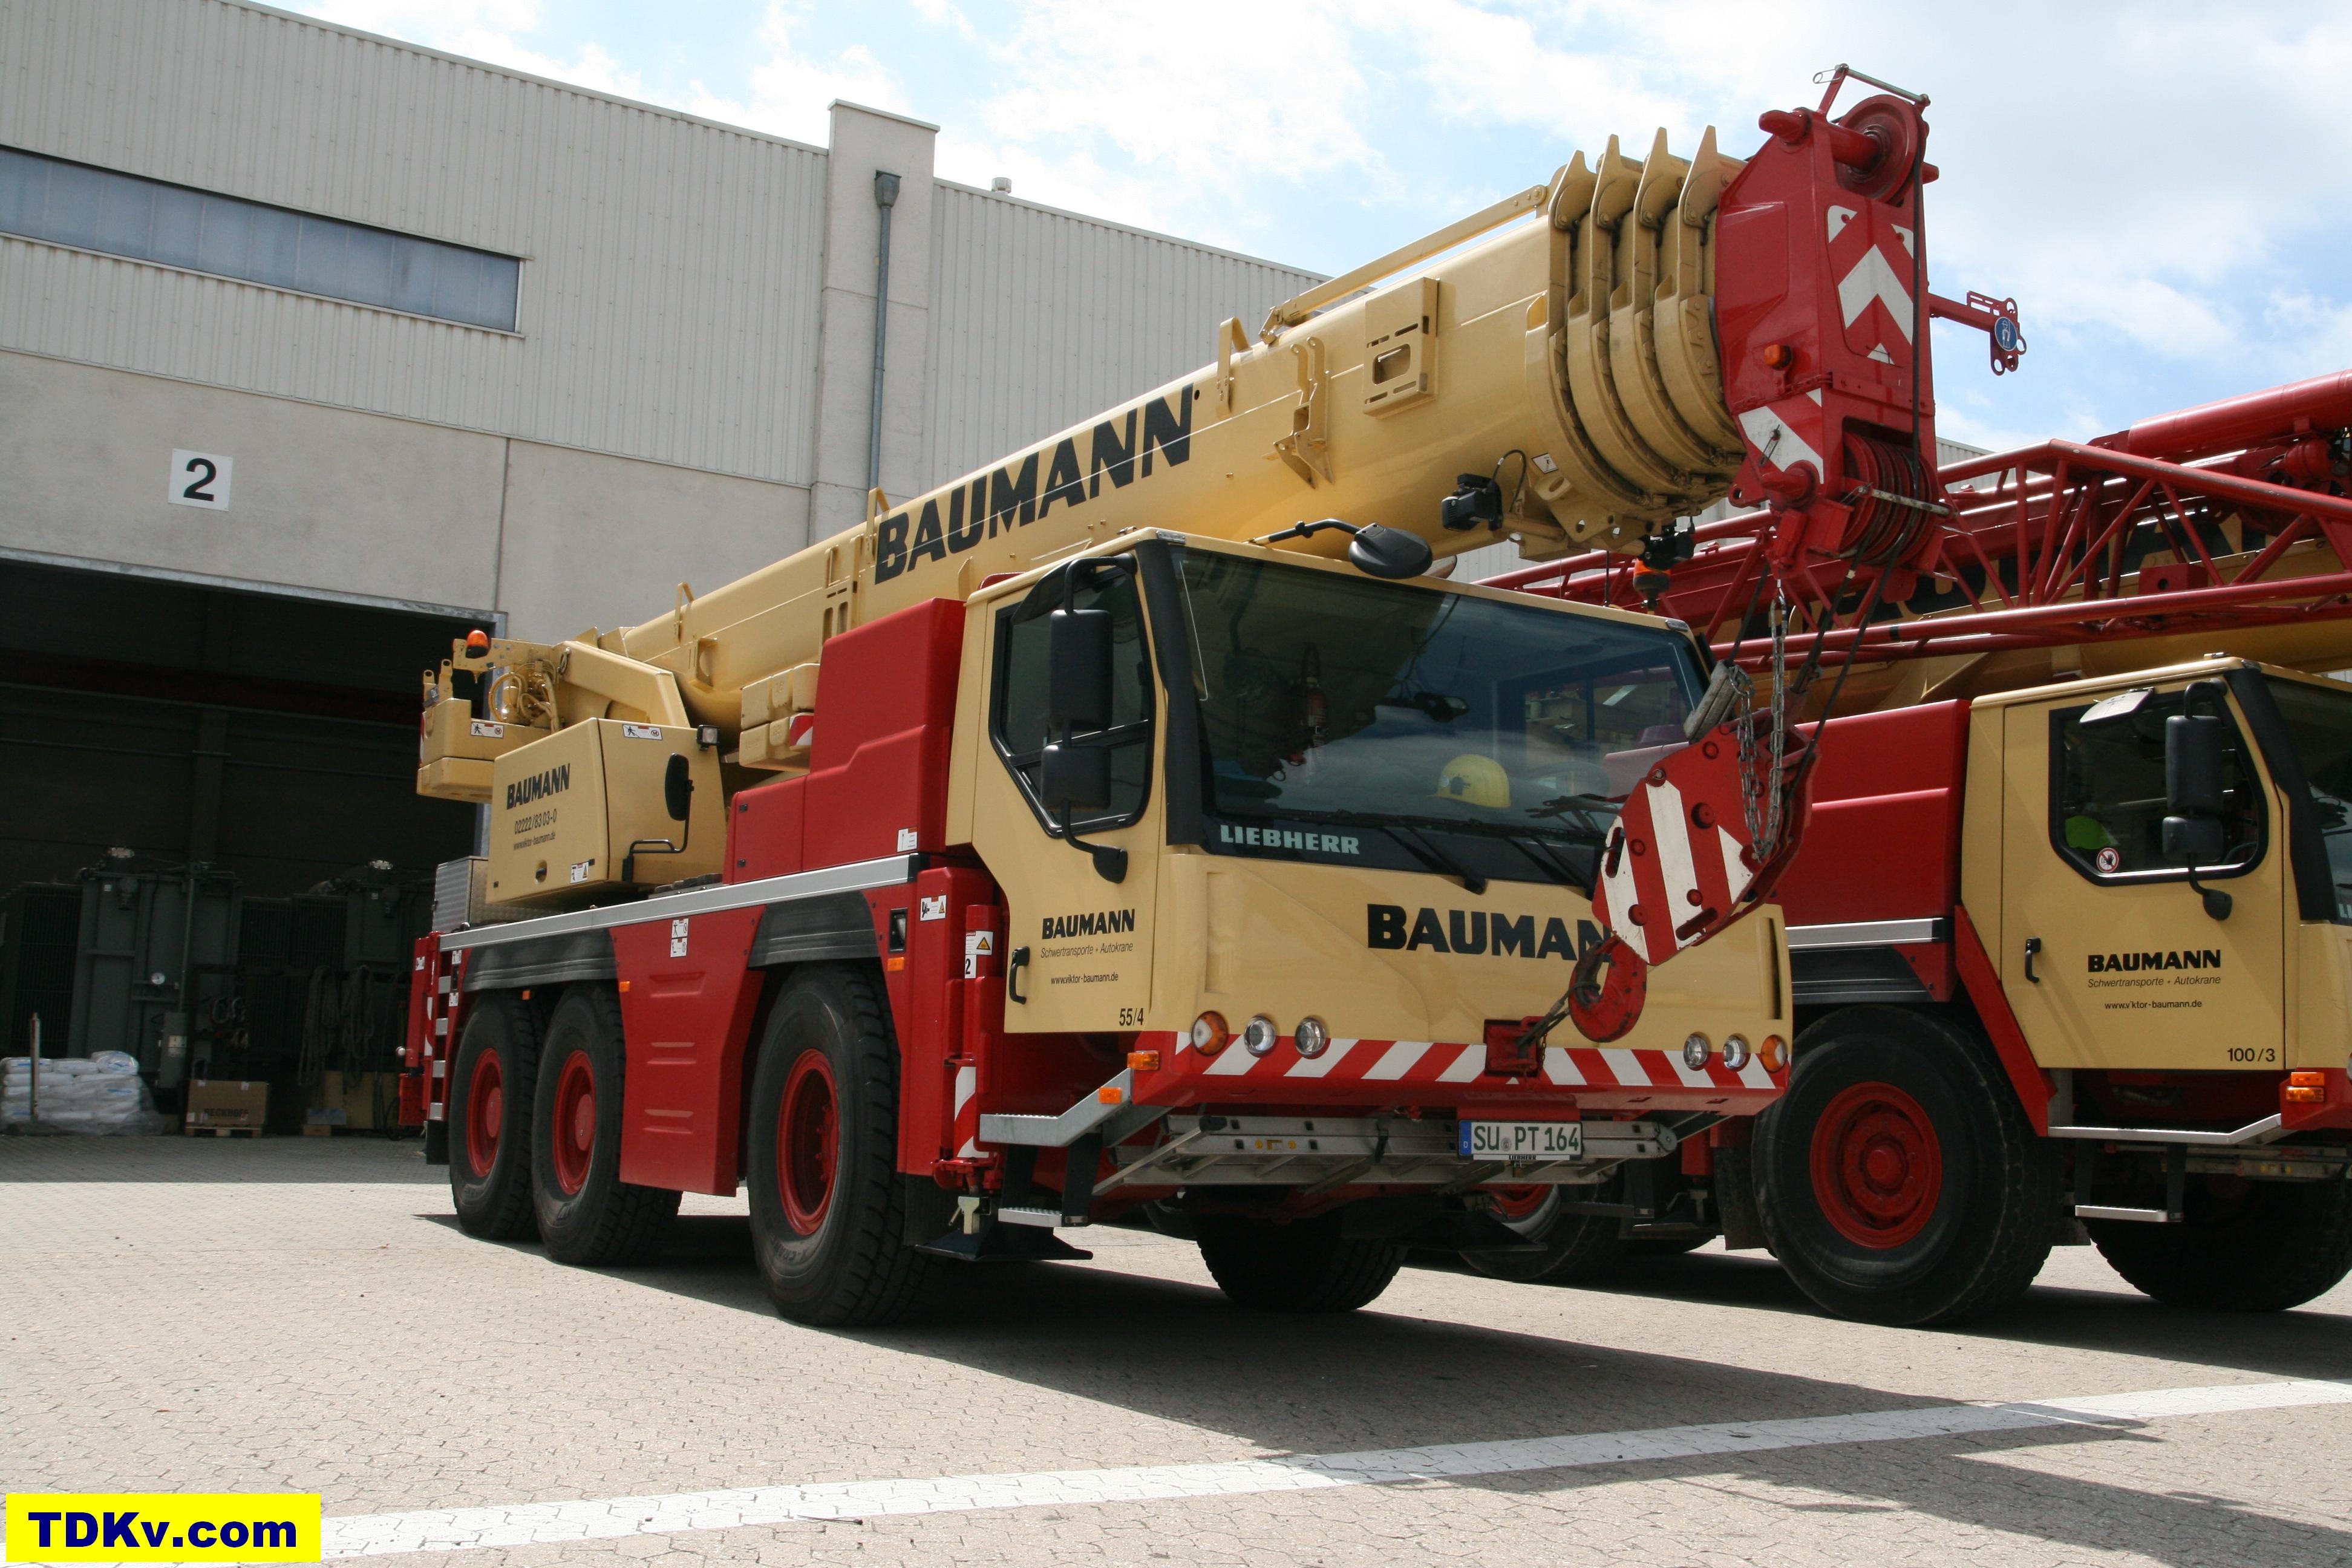 Liebherr LTM 1055/1 Baumann